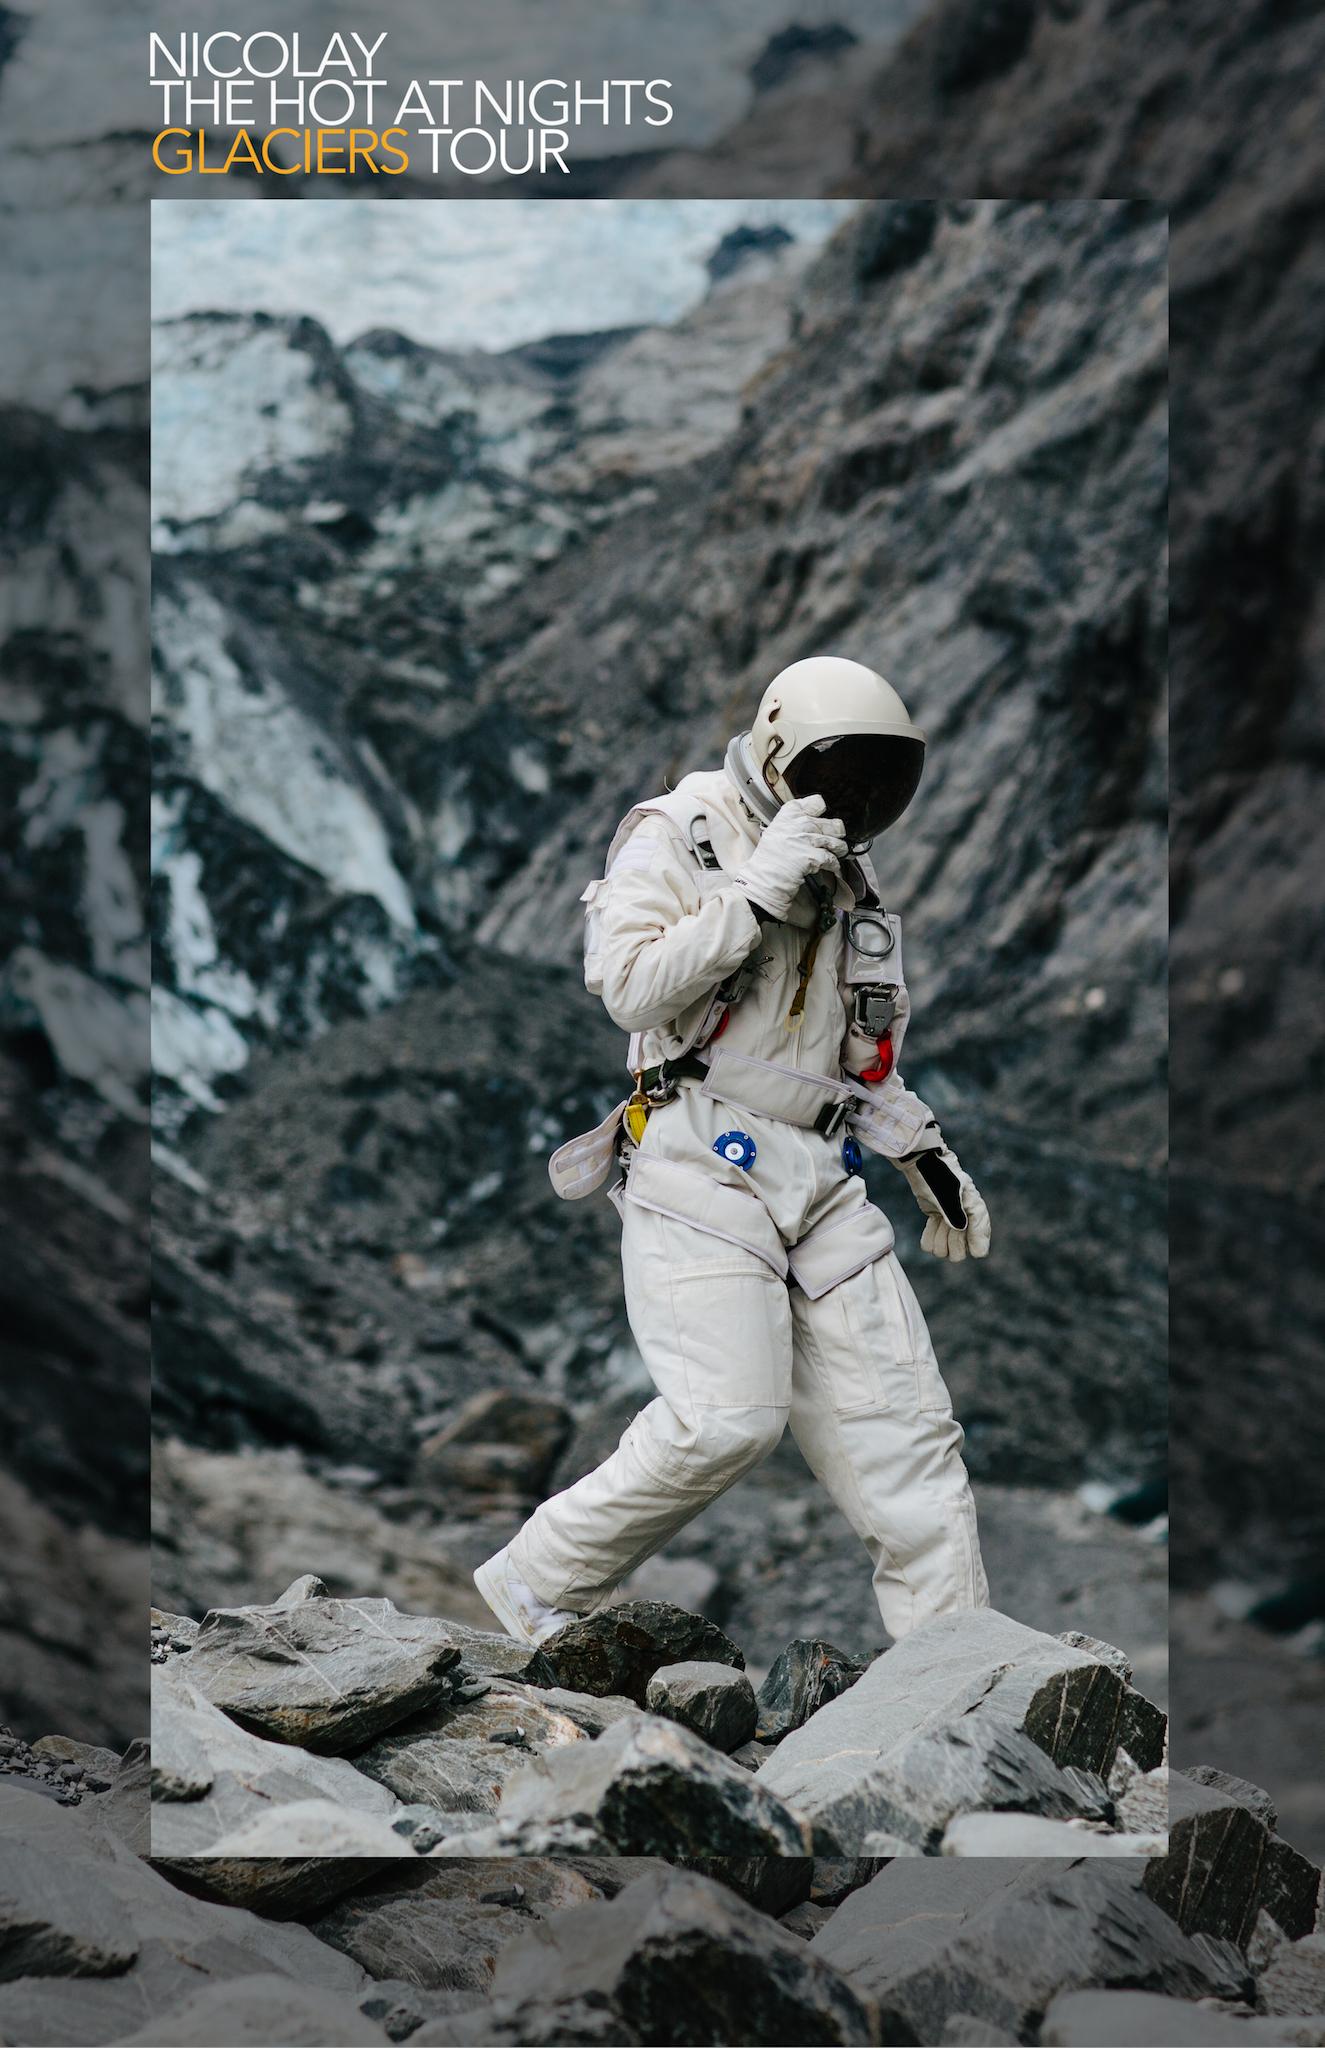 Glaciers_Poster 11x17.jpg